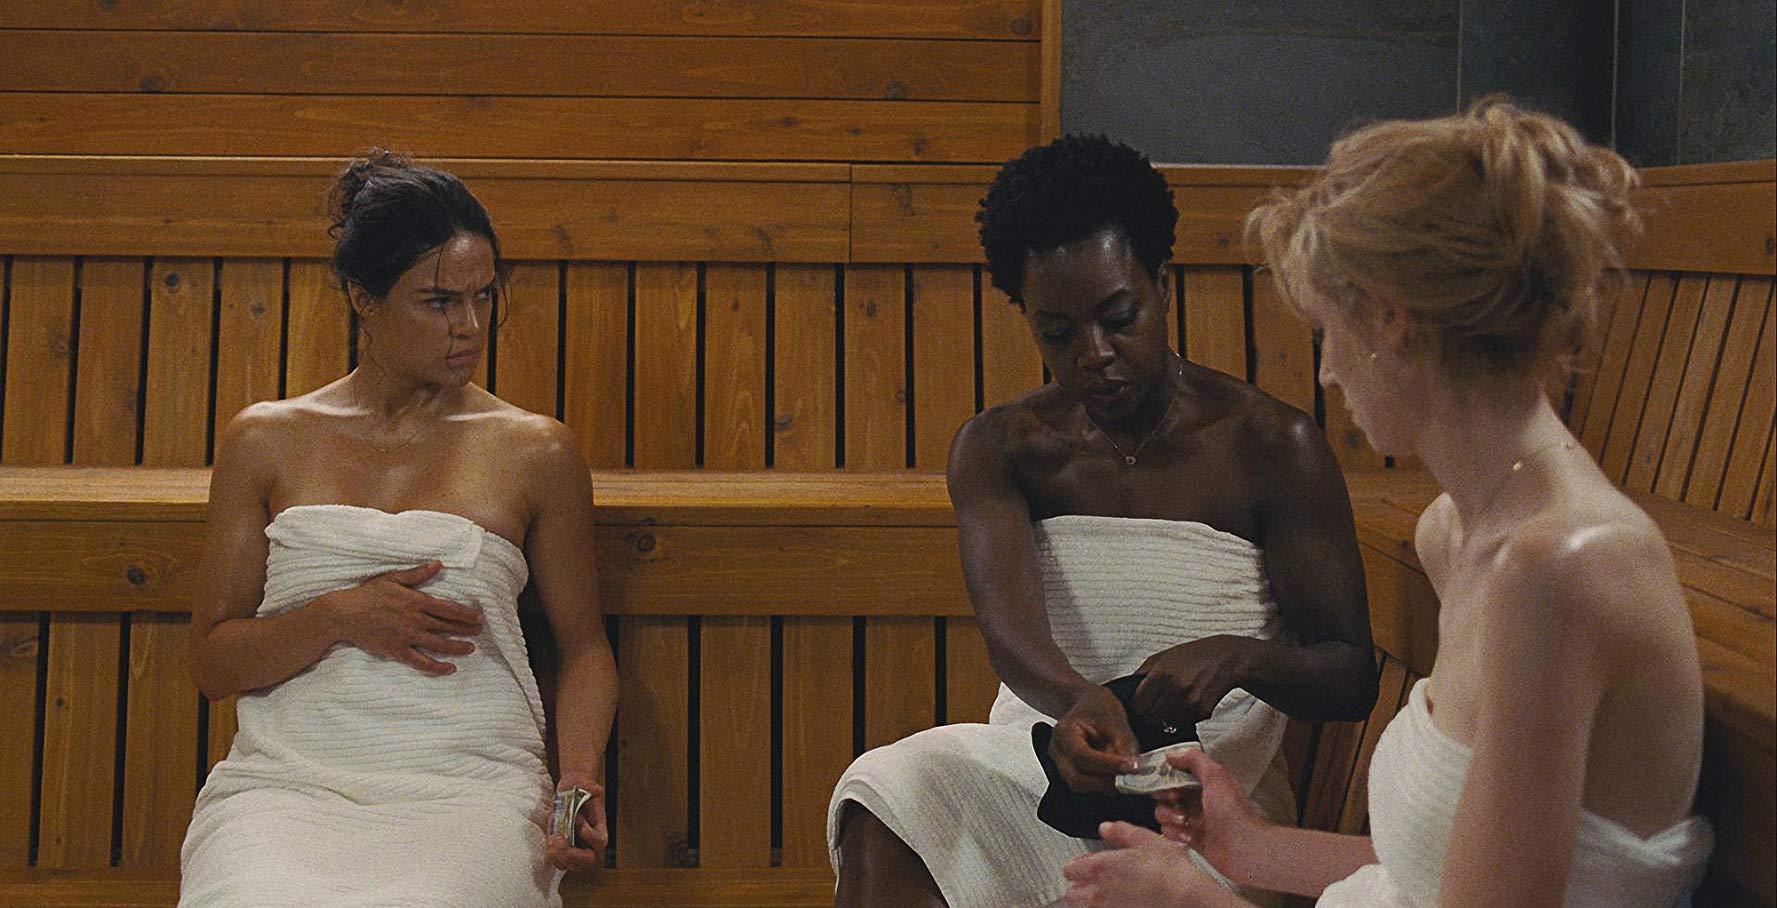 the gals plan a heist in the sauna in WIDOWS